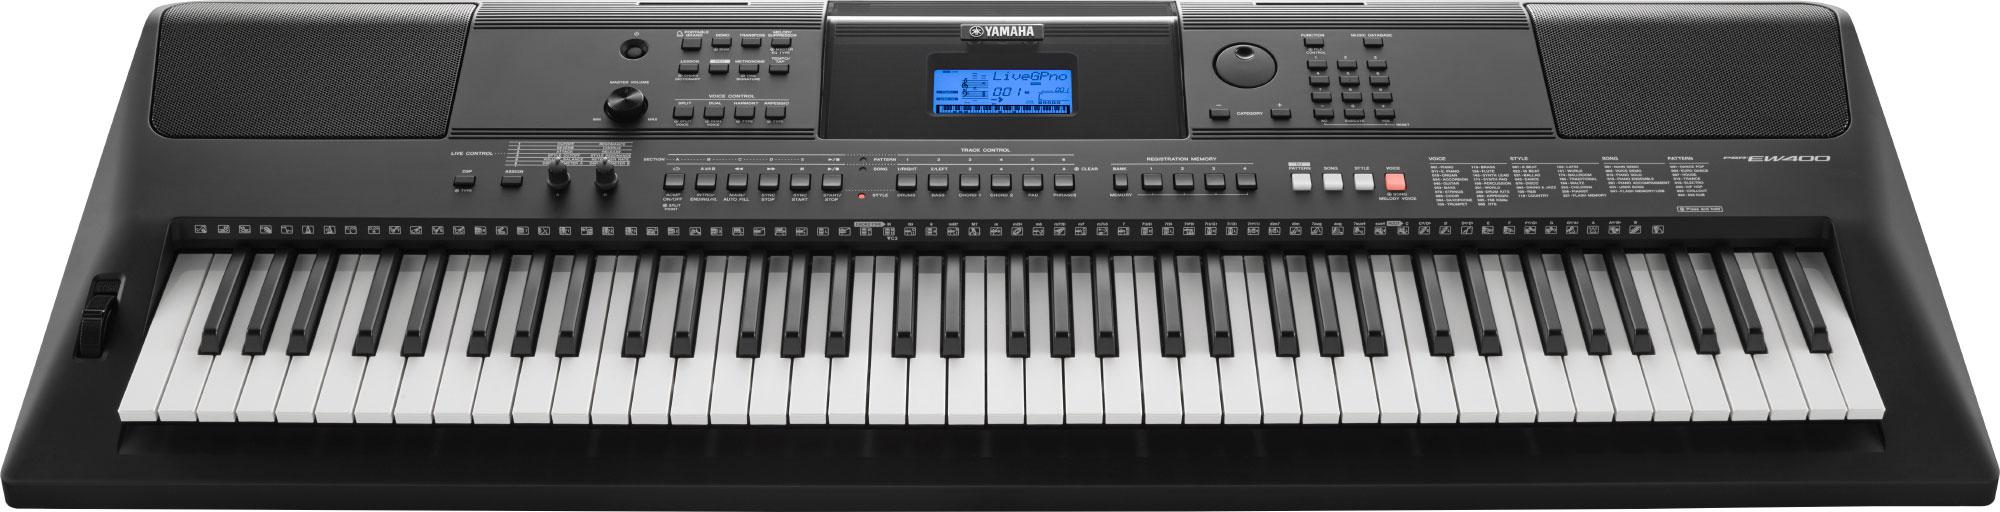 Yamaha E Electronic Keyboard